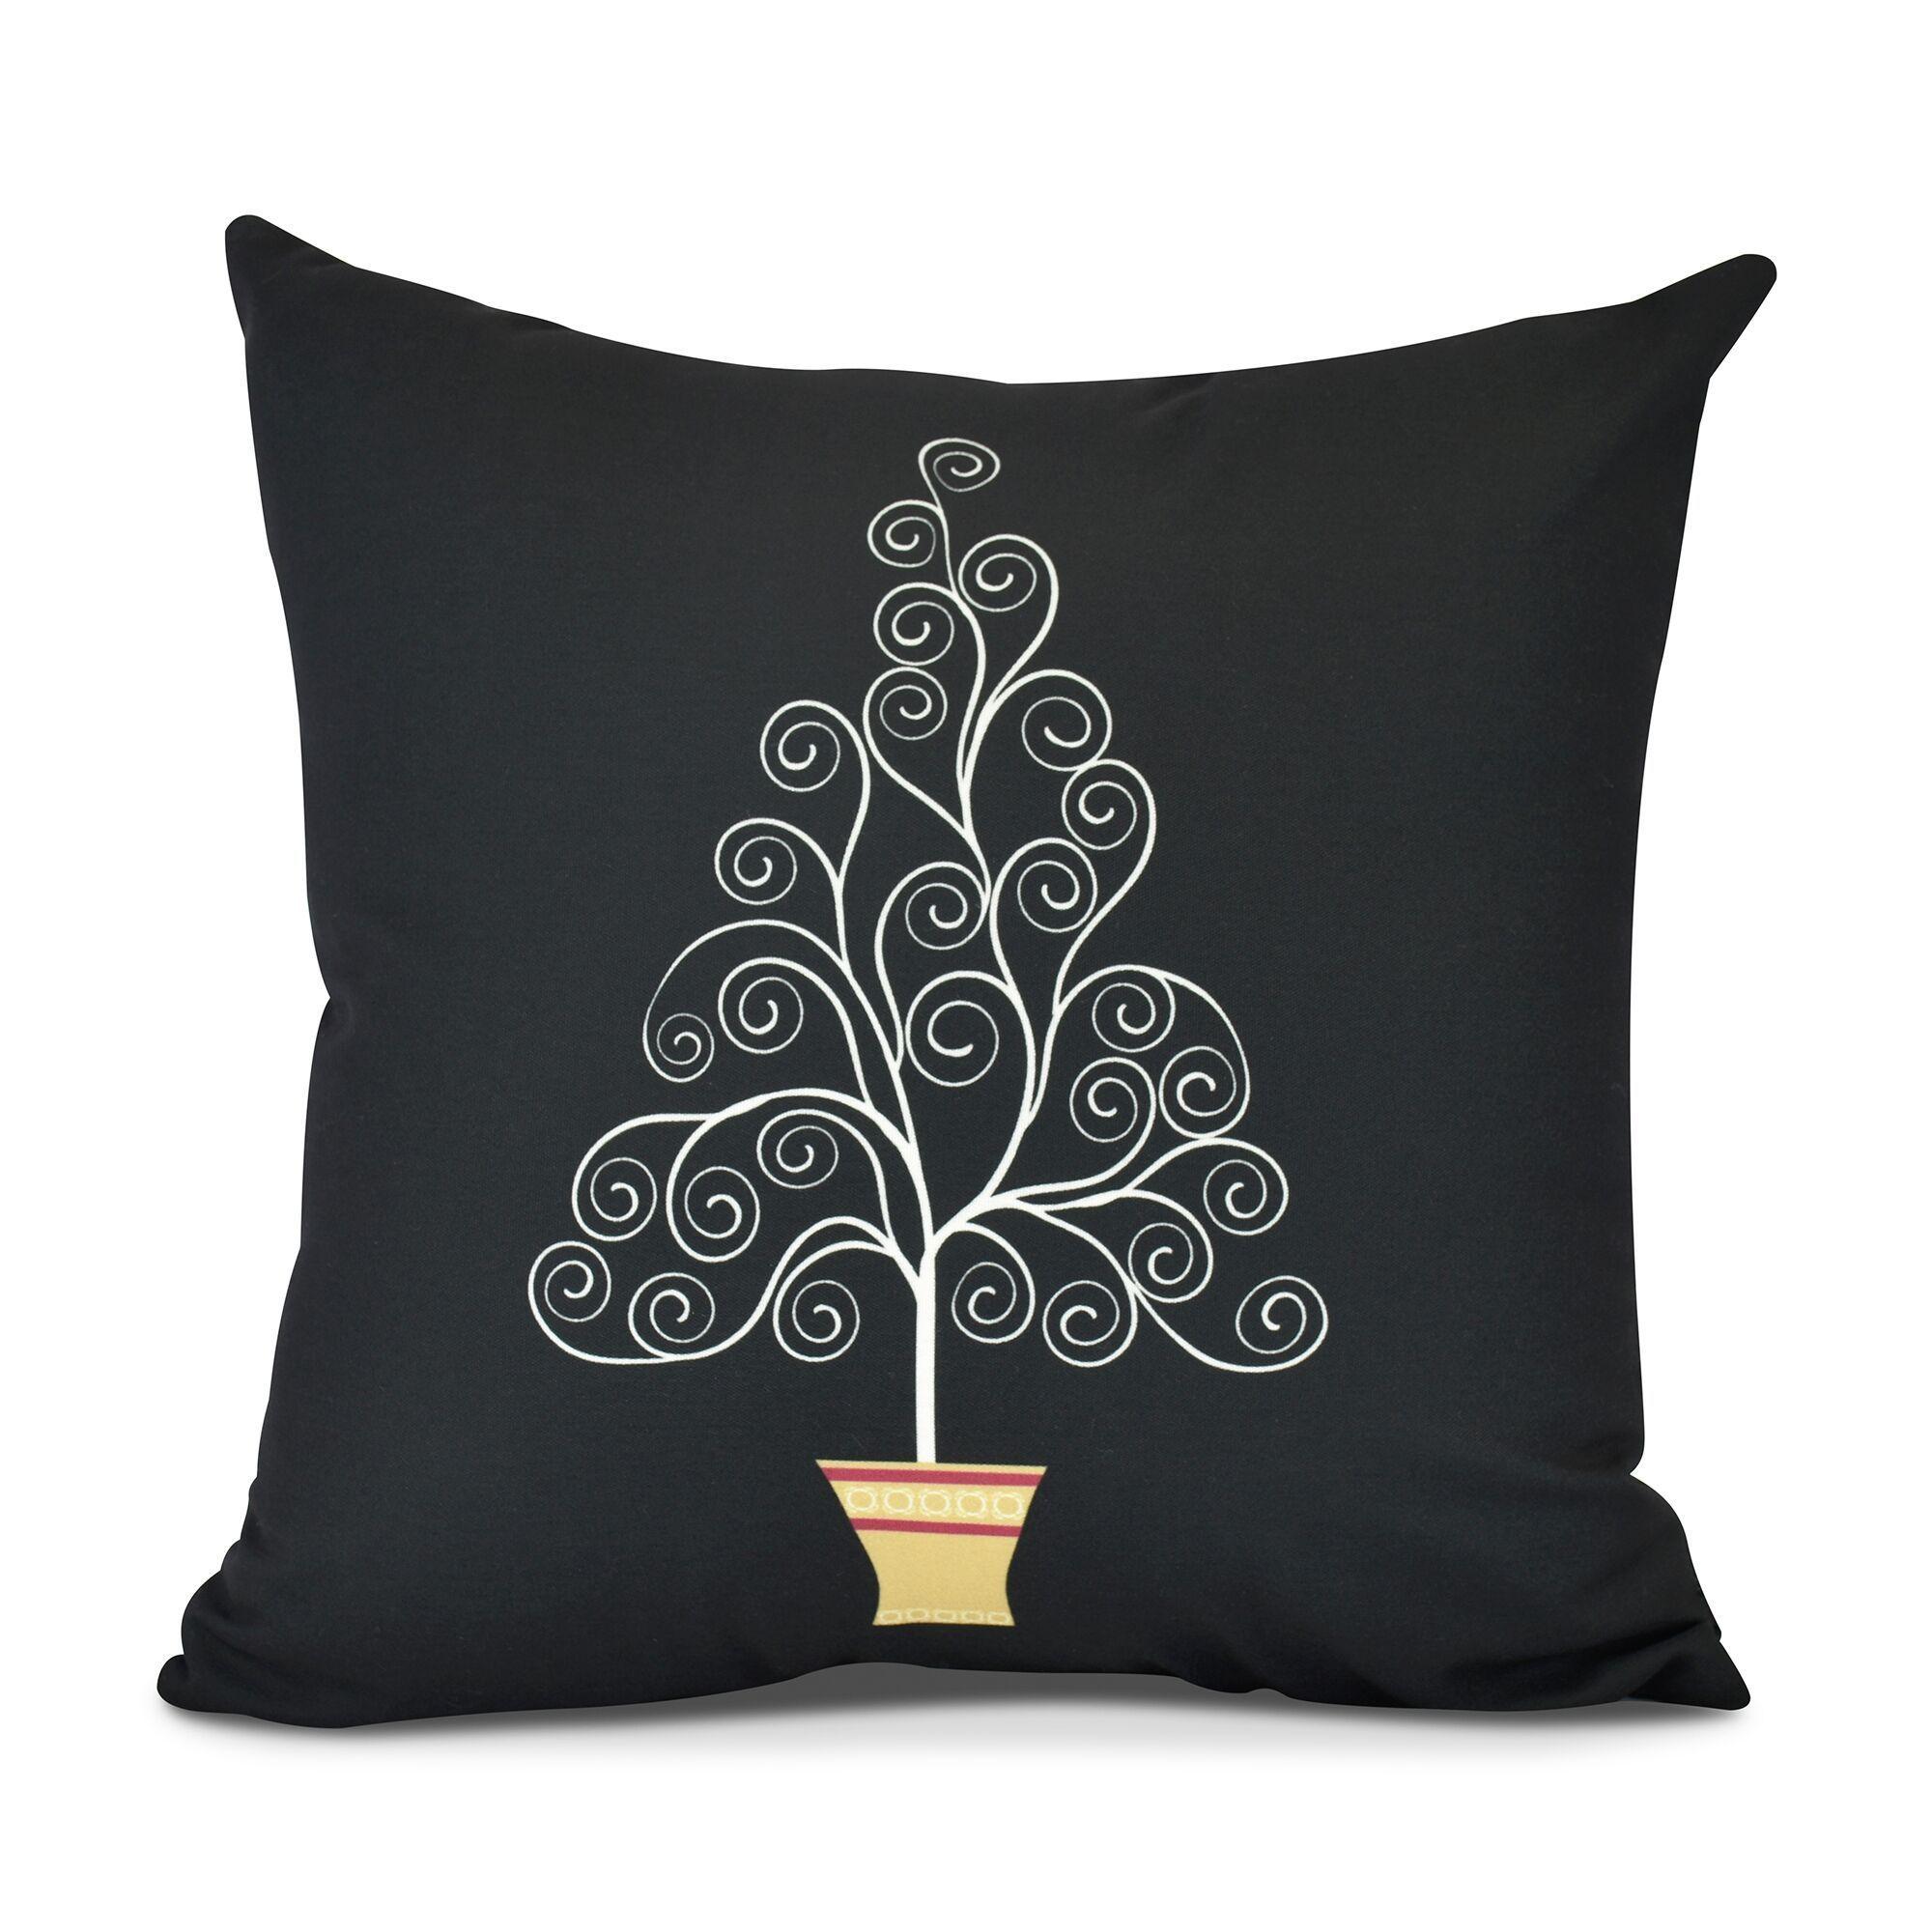 Filigree Tree, Geometric Print Pillow | eBay